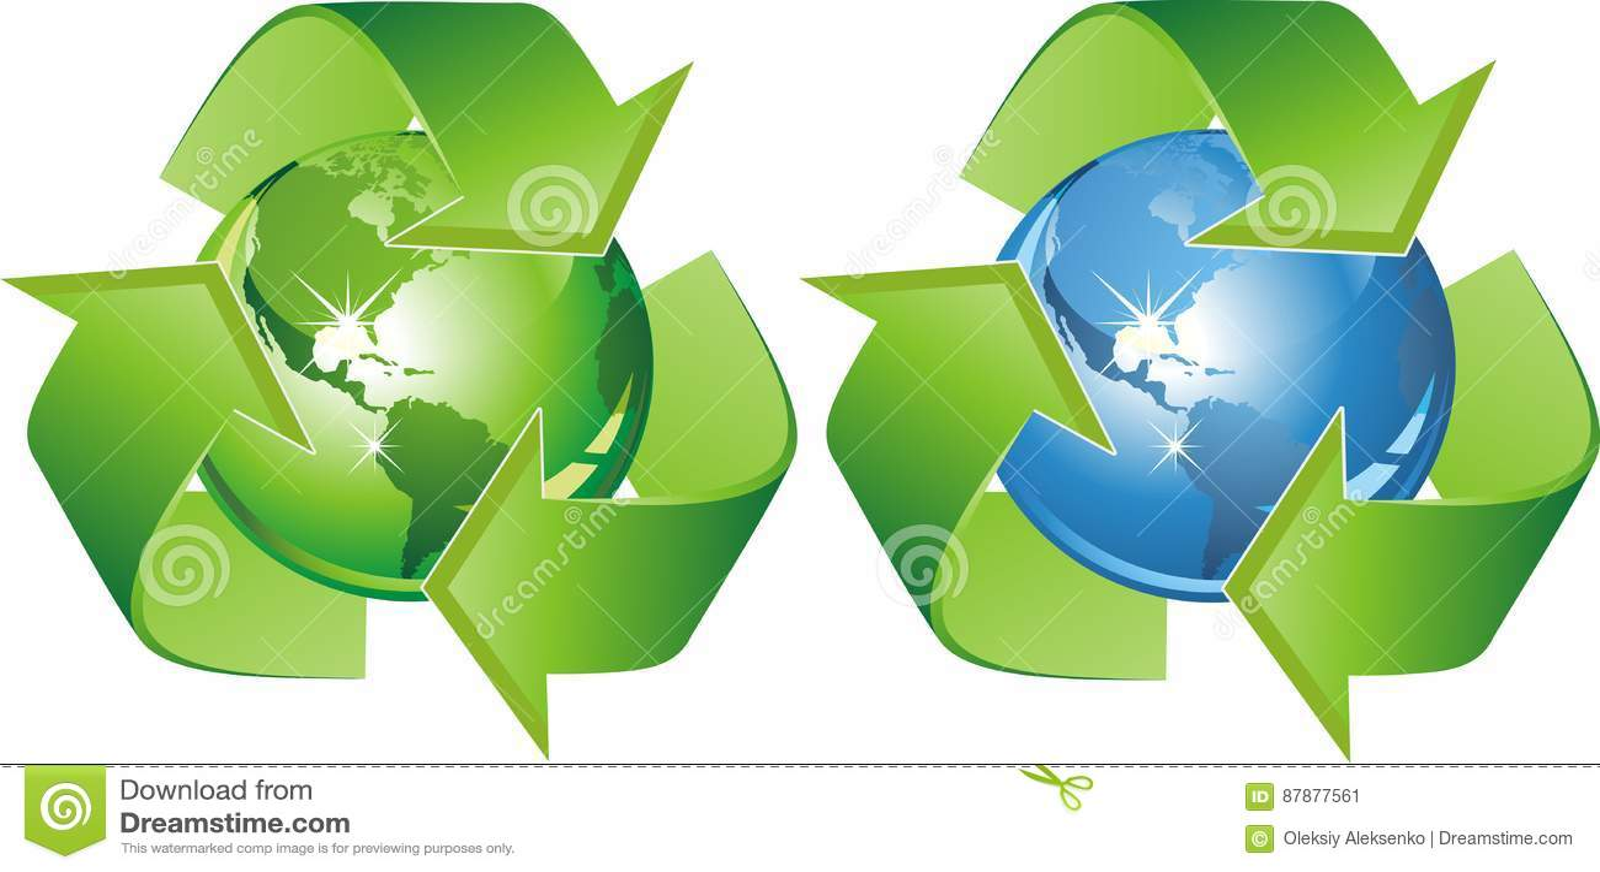 Smbolo ecolgico terra cercada com setas verdes proteo do sinal download comp ccuart Image collections